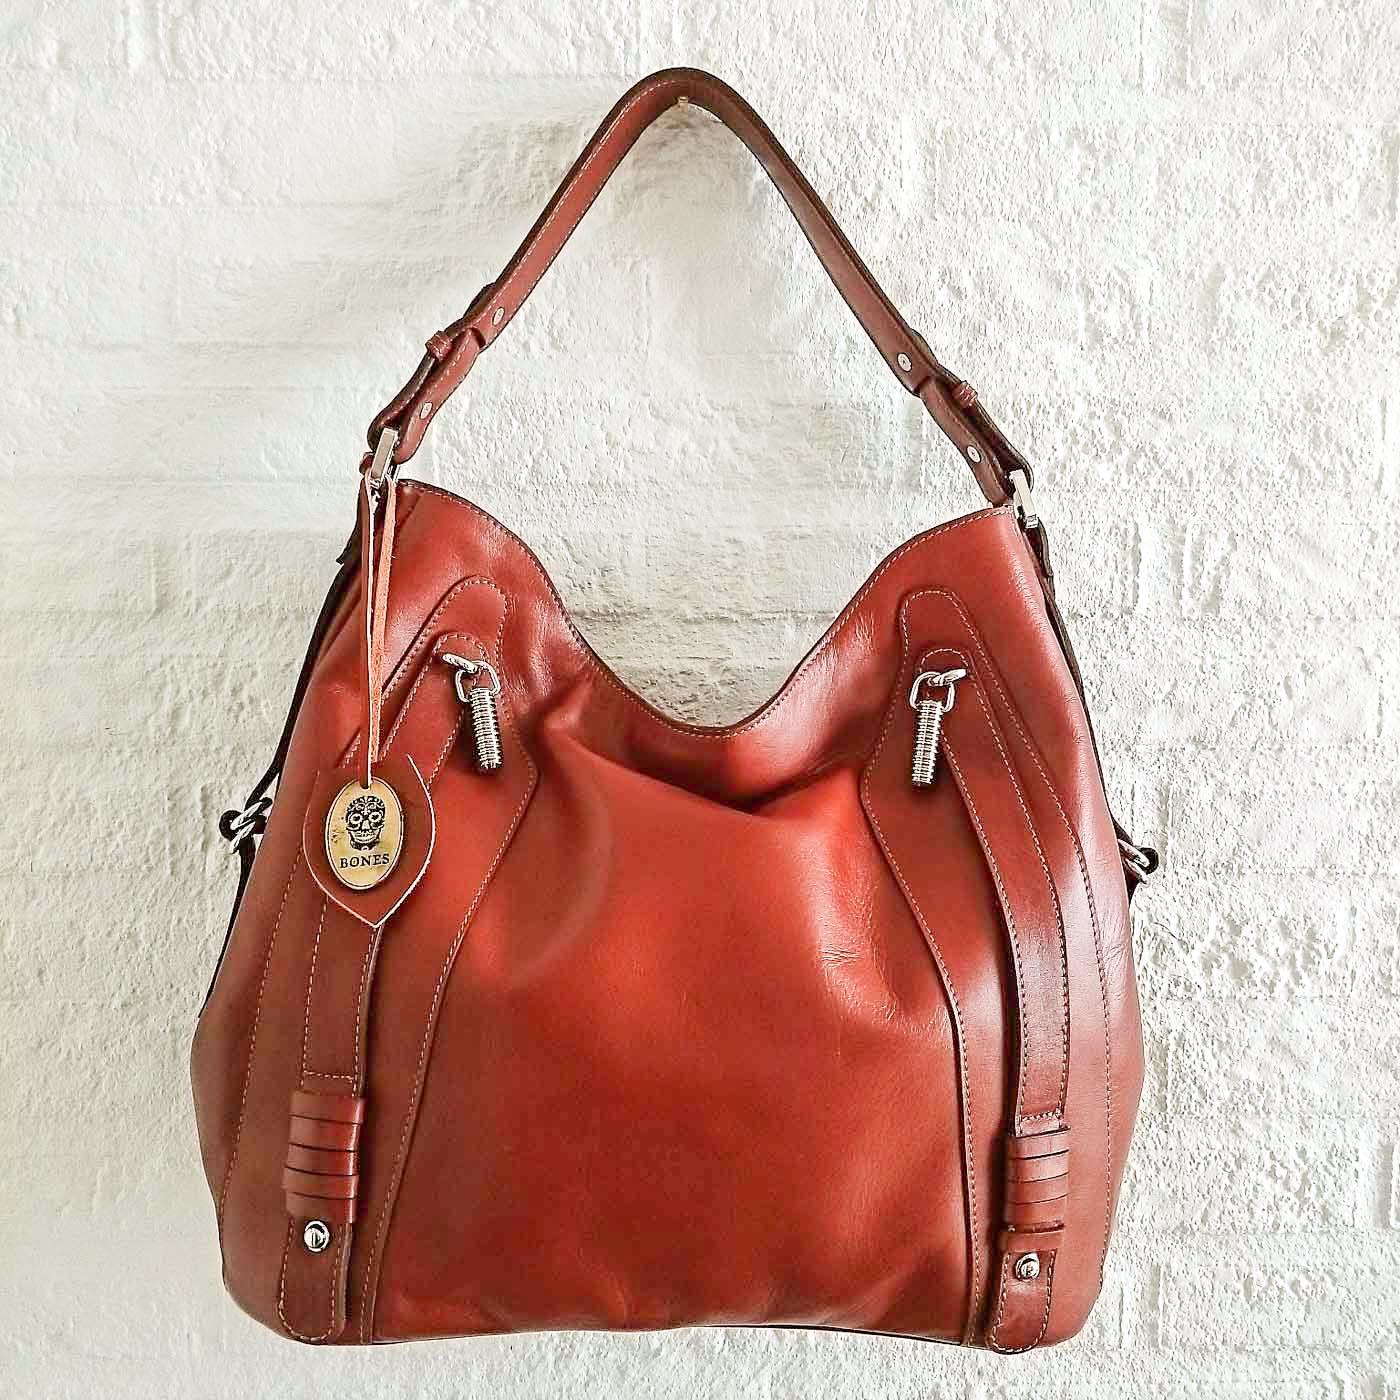 BONES Romina - Full grain leather handbag